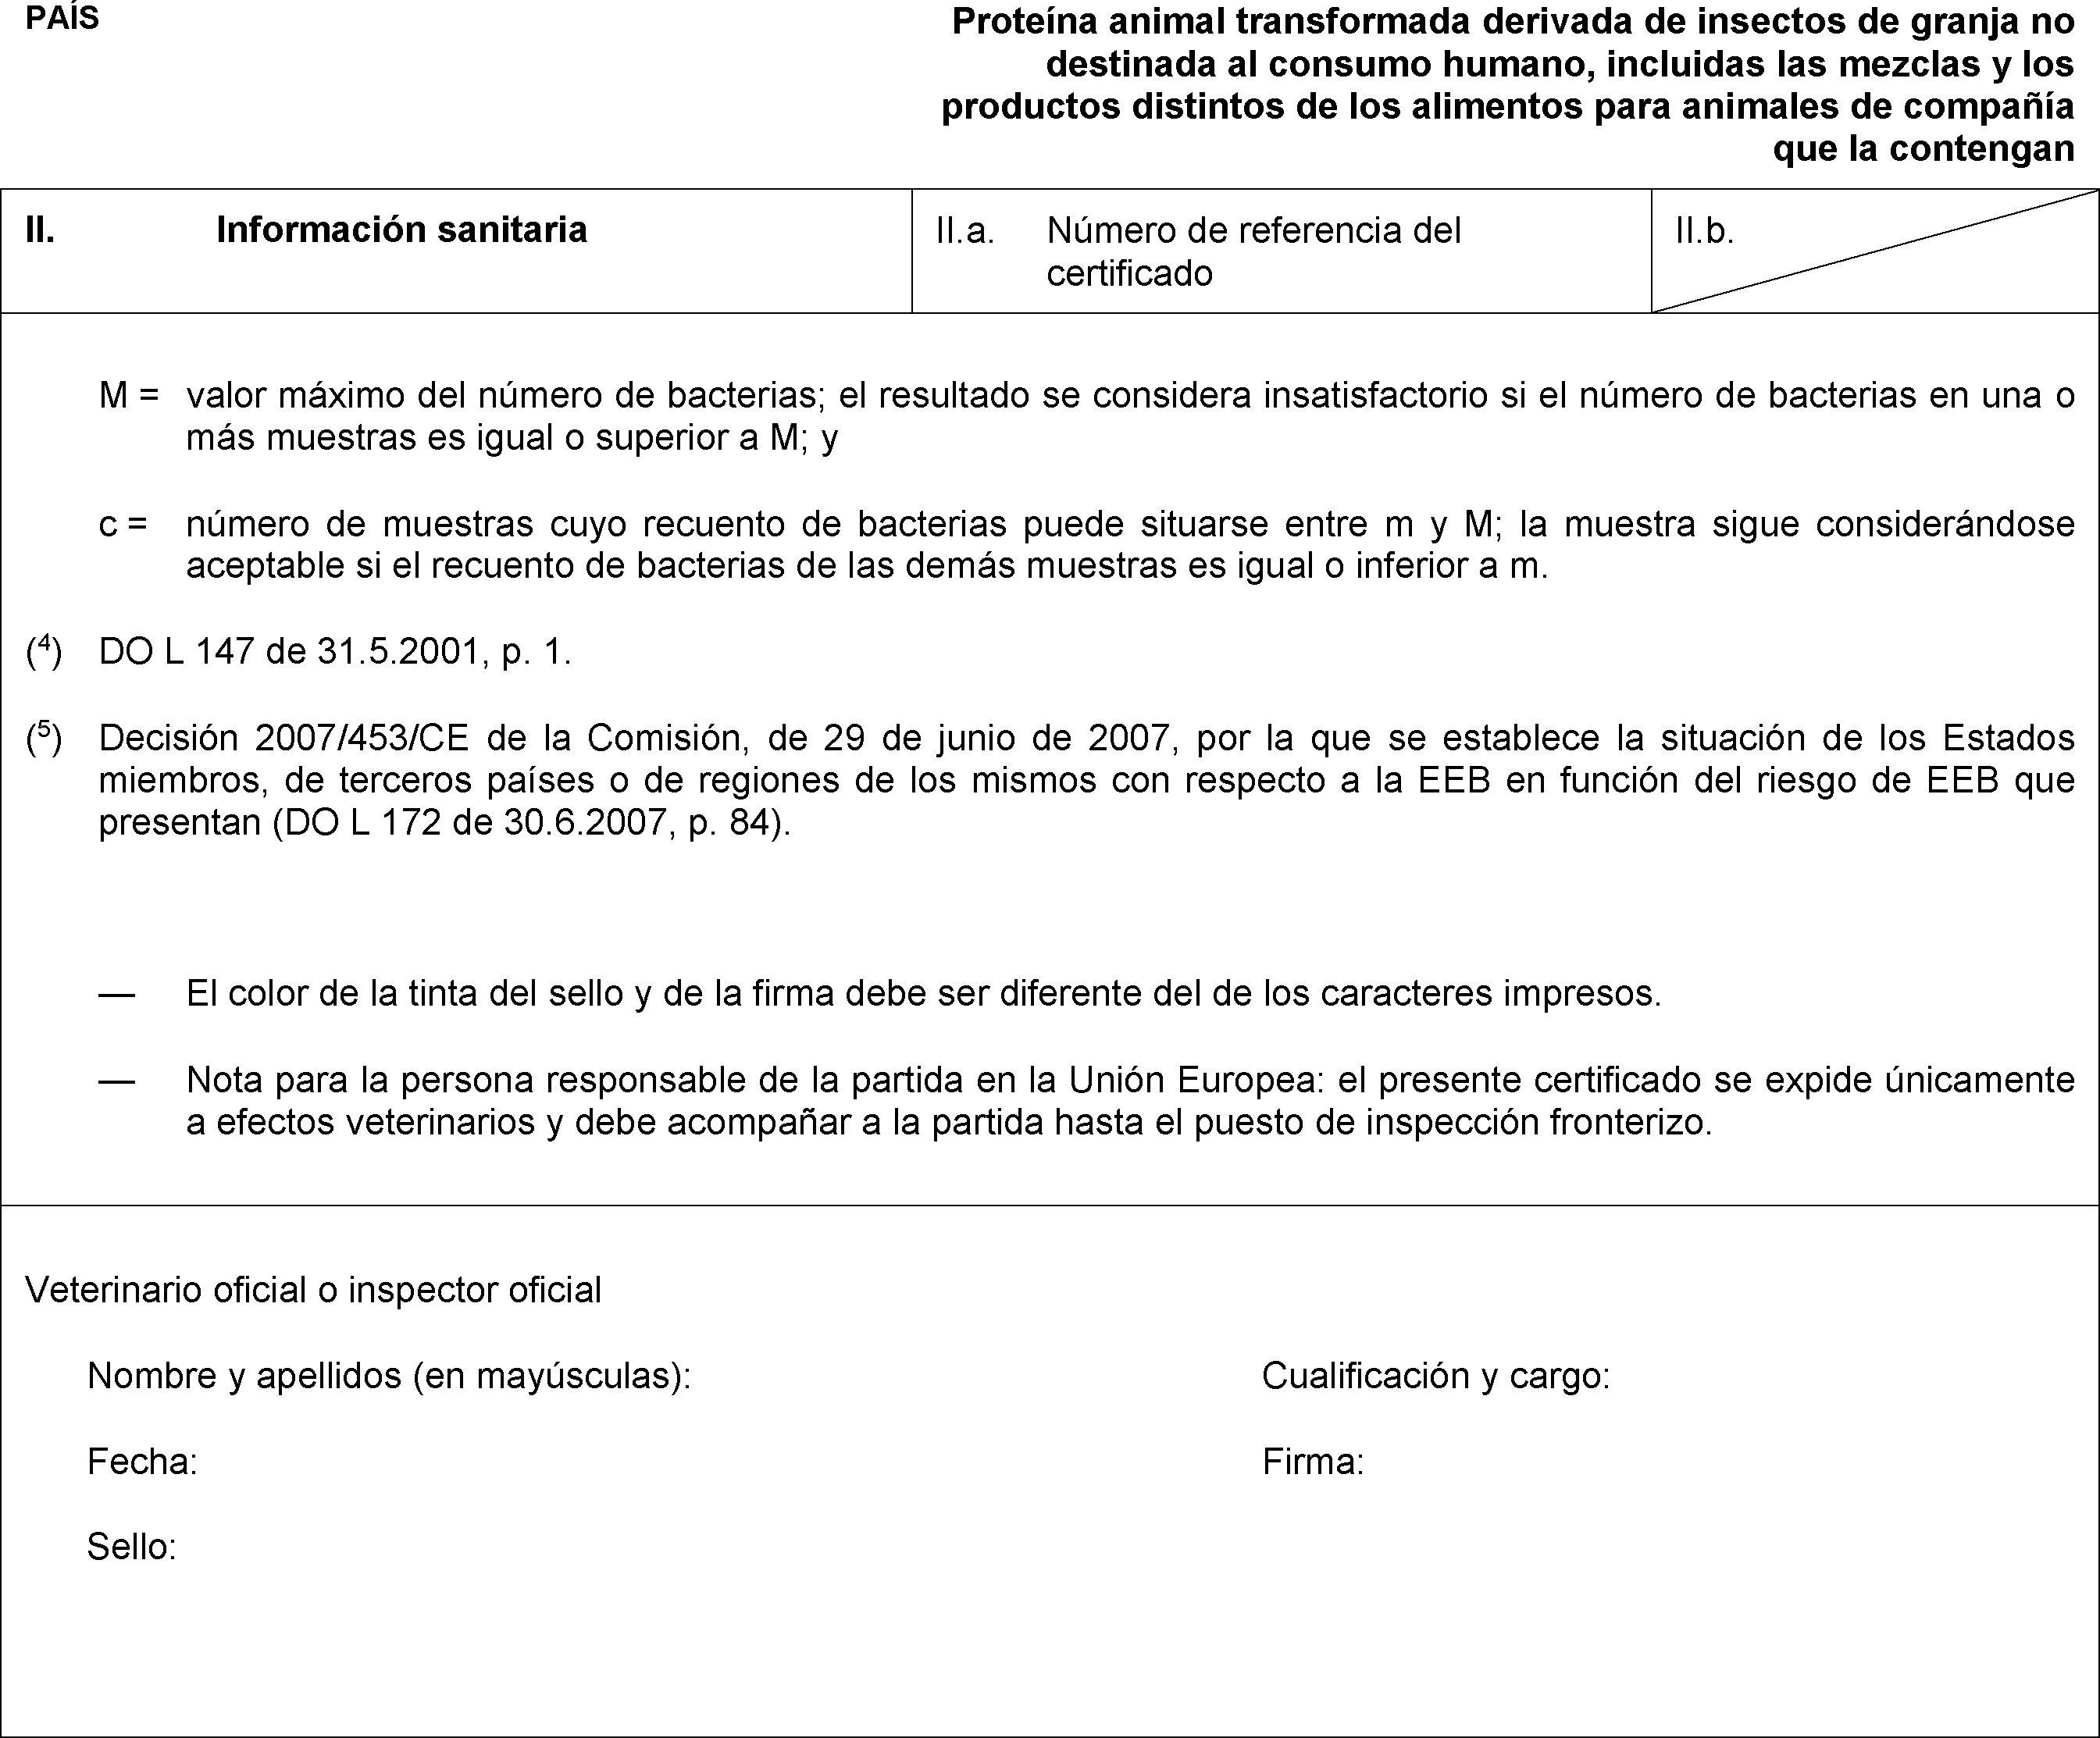 EUR-Lex - 02011R0142-20170701 - EN - EUR-Lex